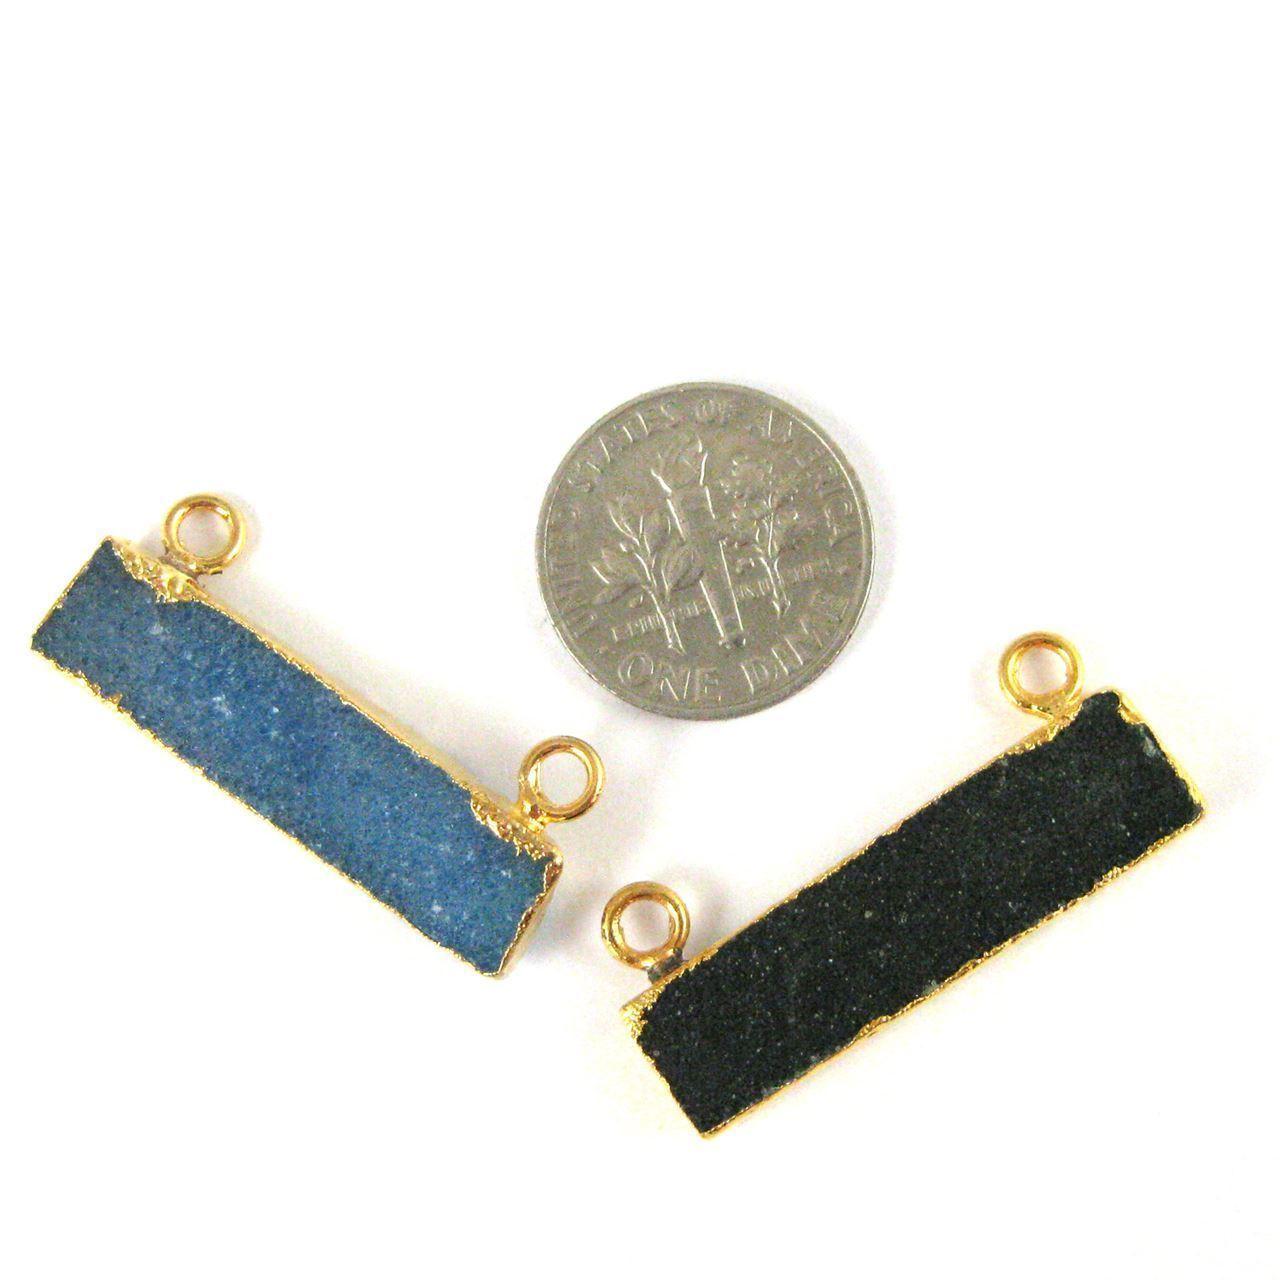 Natural Druzy Agate Bar Connector Pendant, 24K Gold plated Long Horizontal Bar- Pink